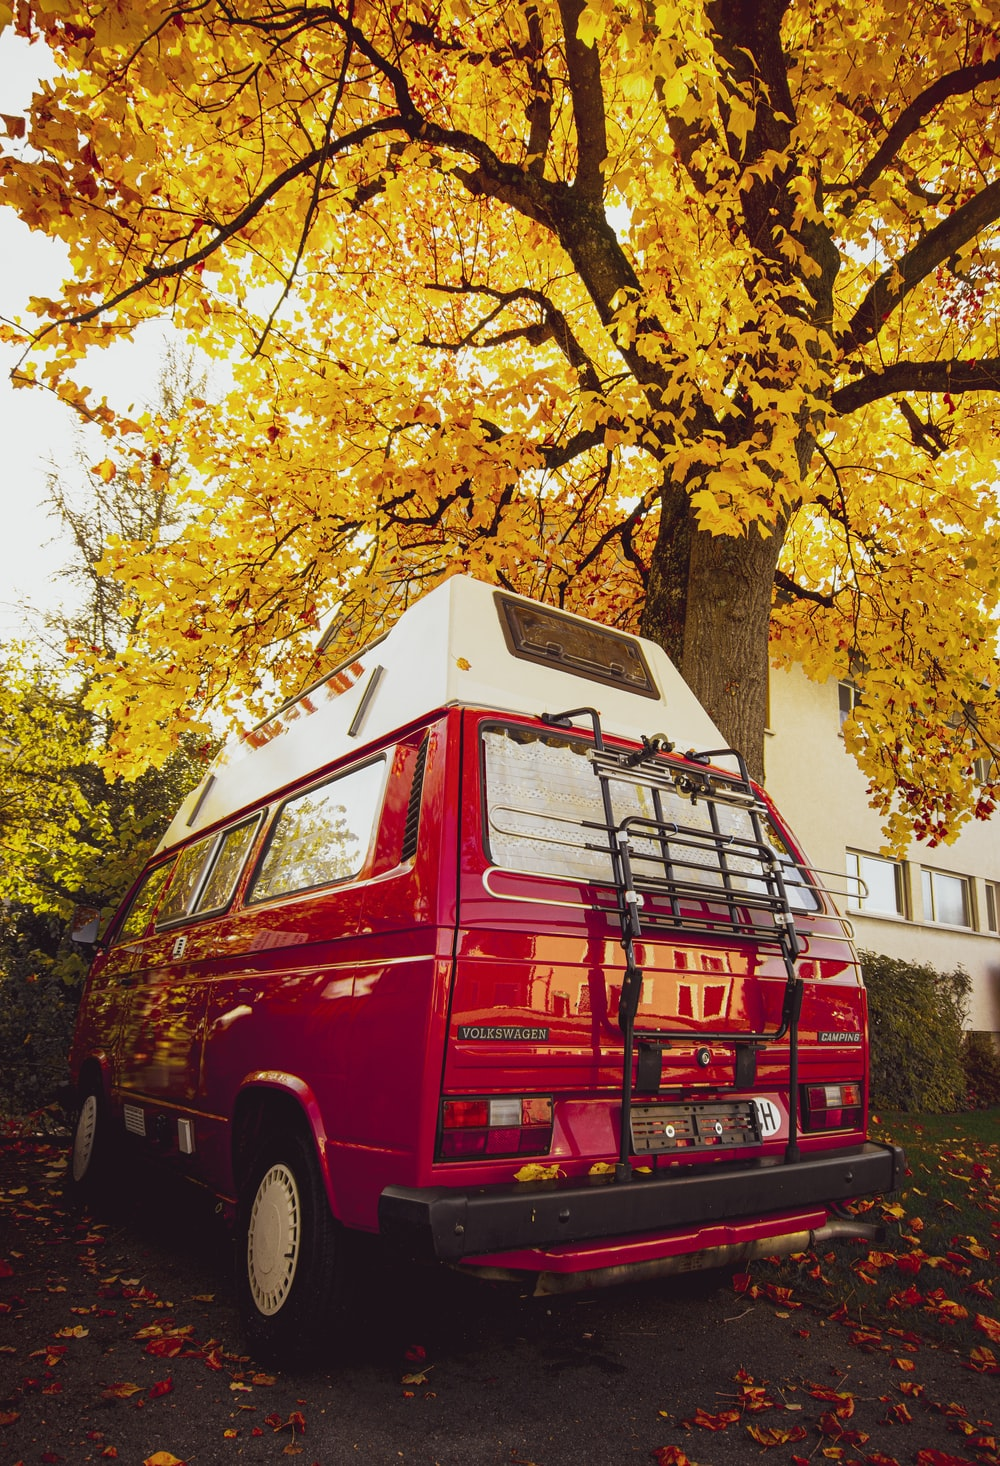 red van parked beside yellow leaf tree